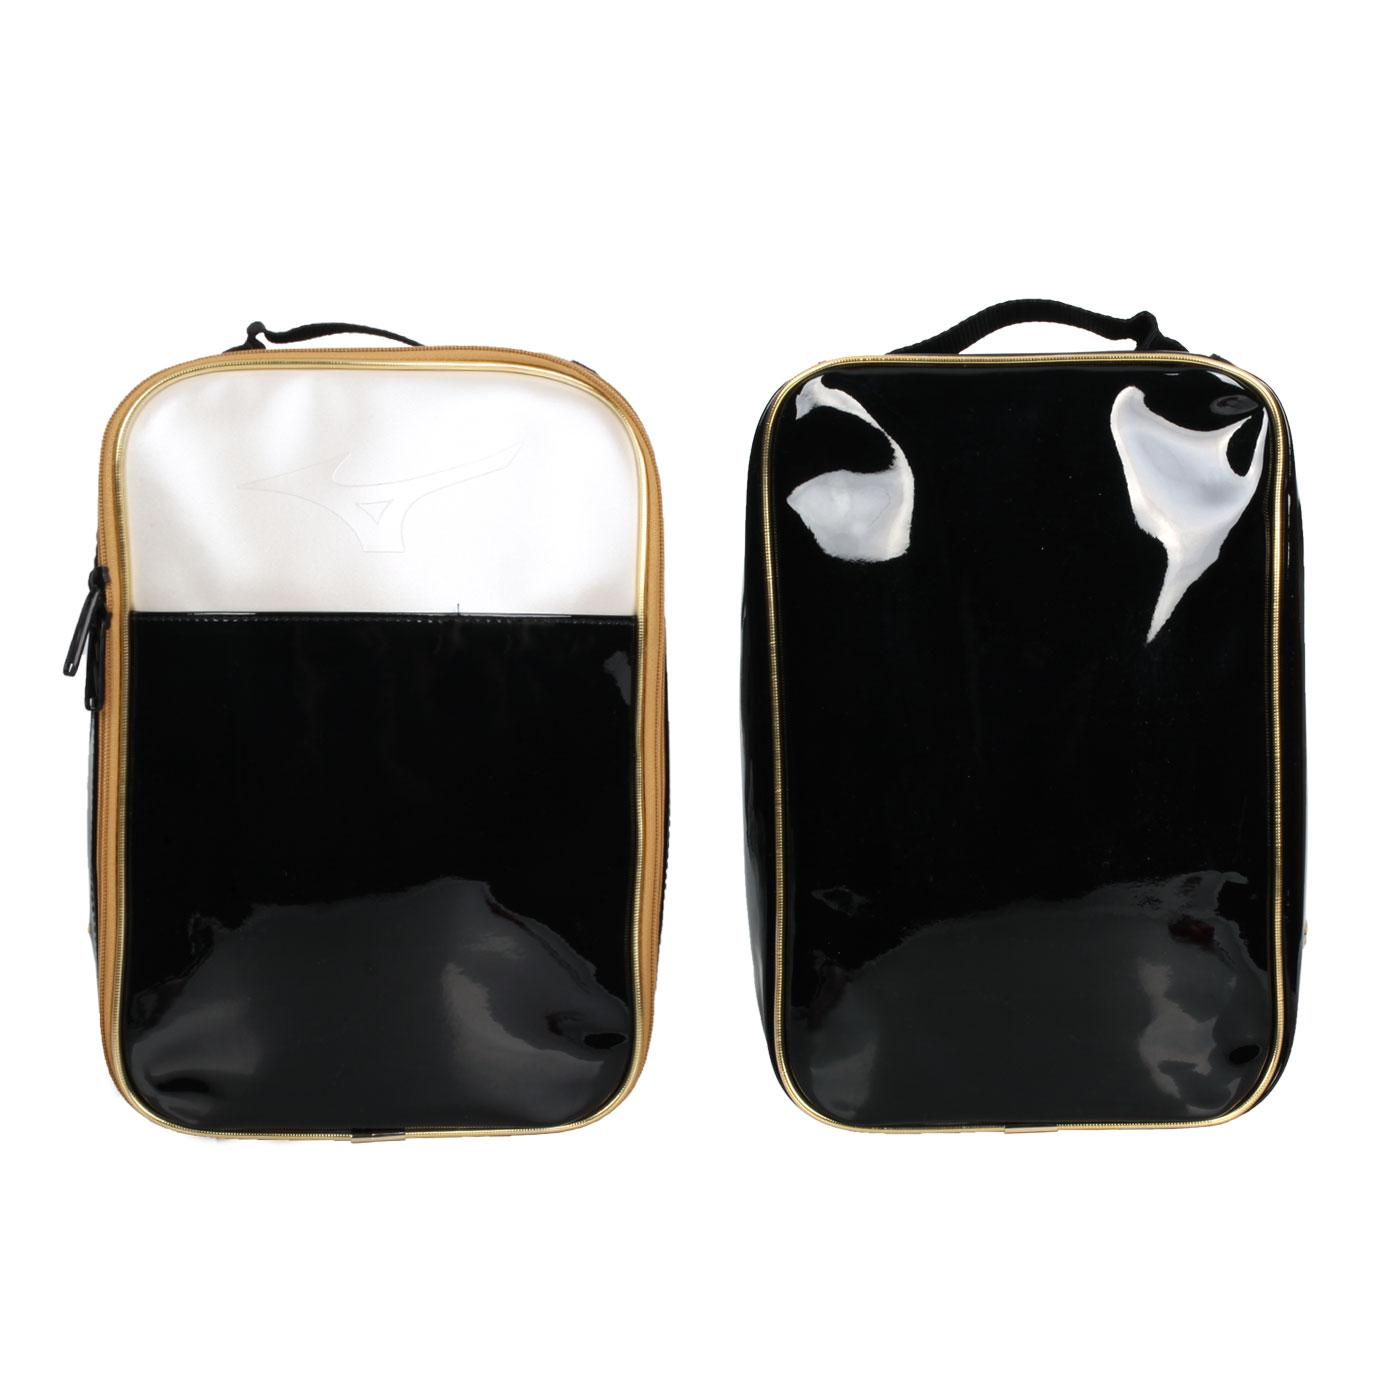 MIZUNO 鞋袋 1FTK131309 - 黑金銀